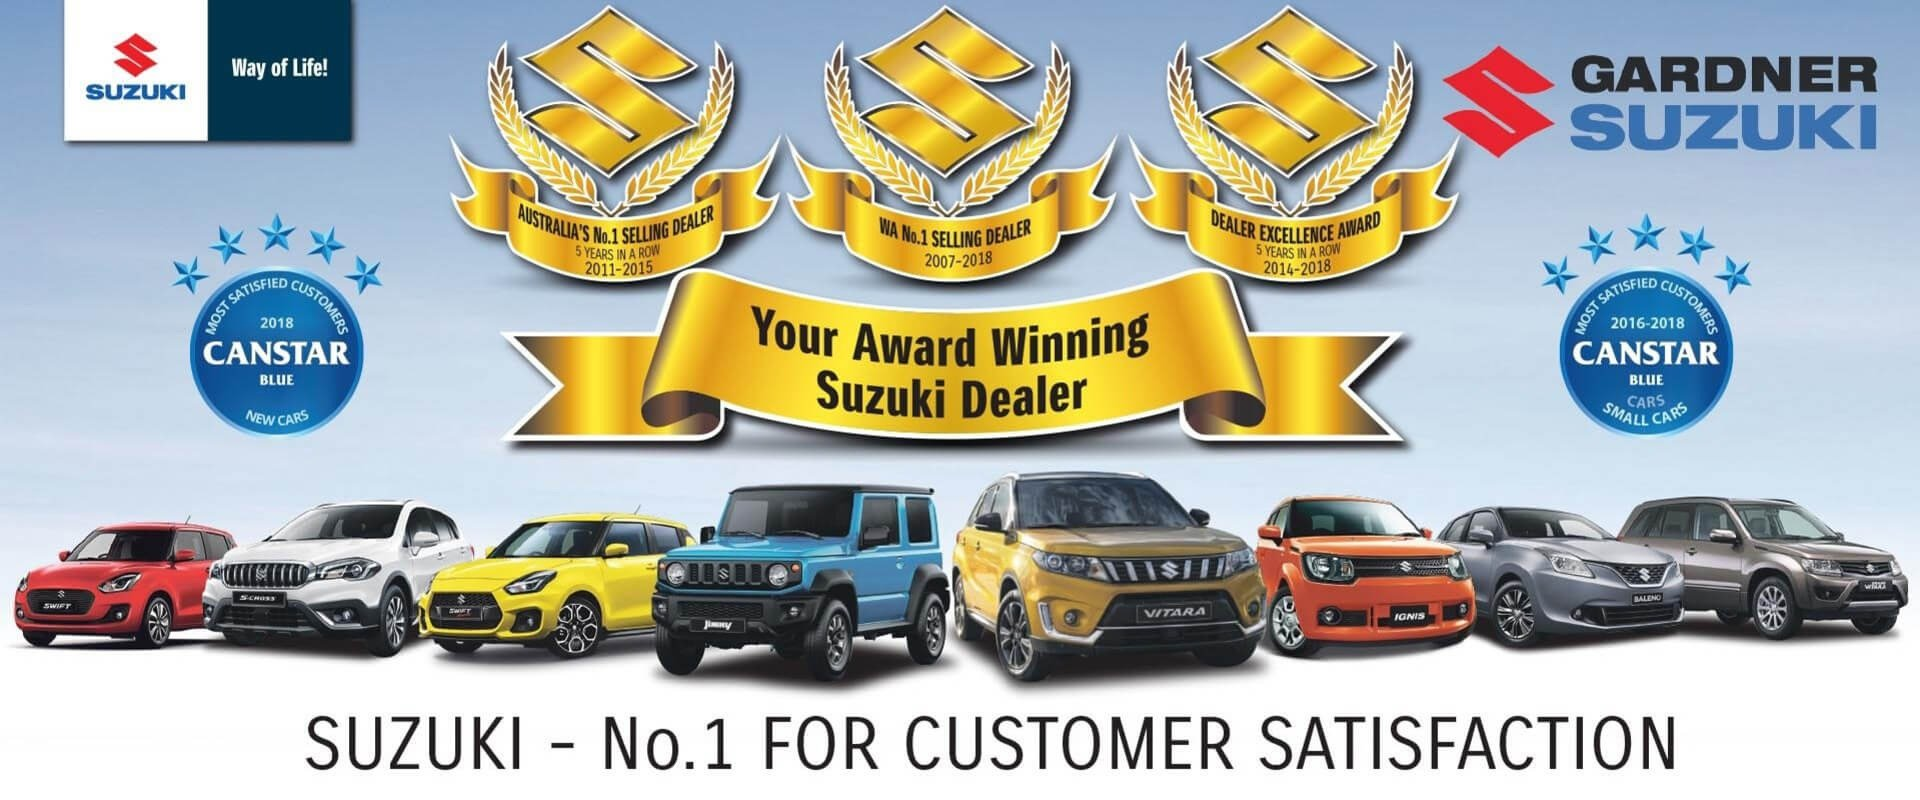 Suzuki - No.1 for Customer Service